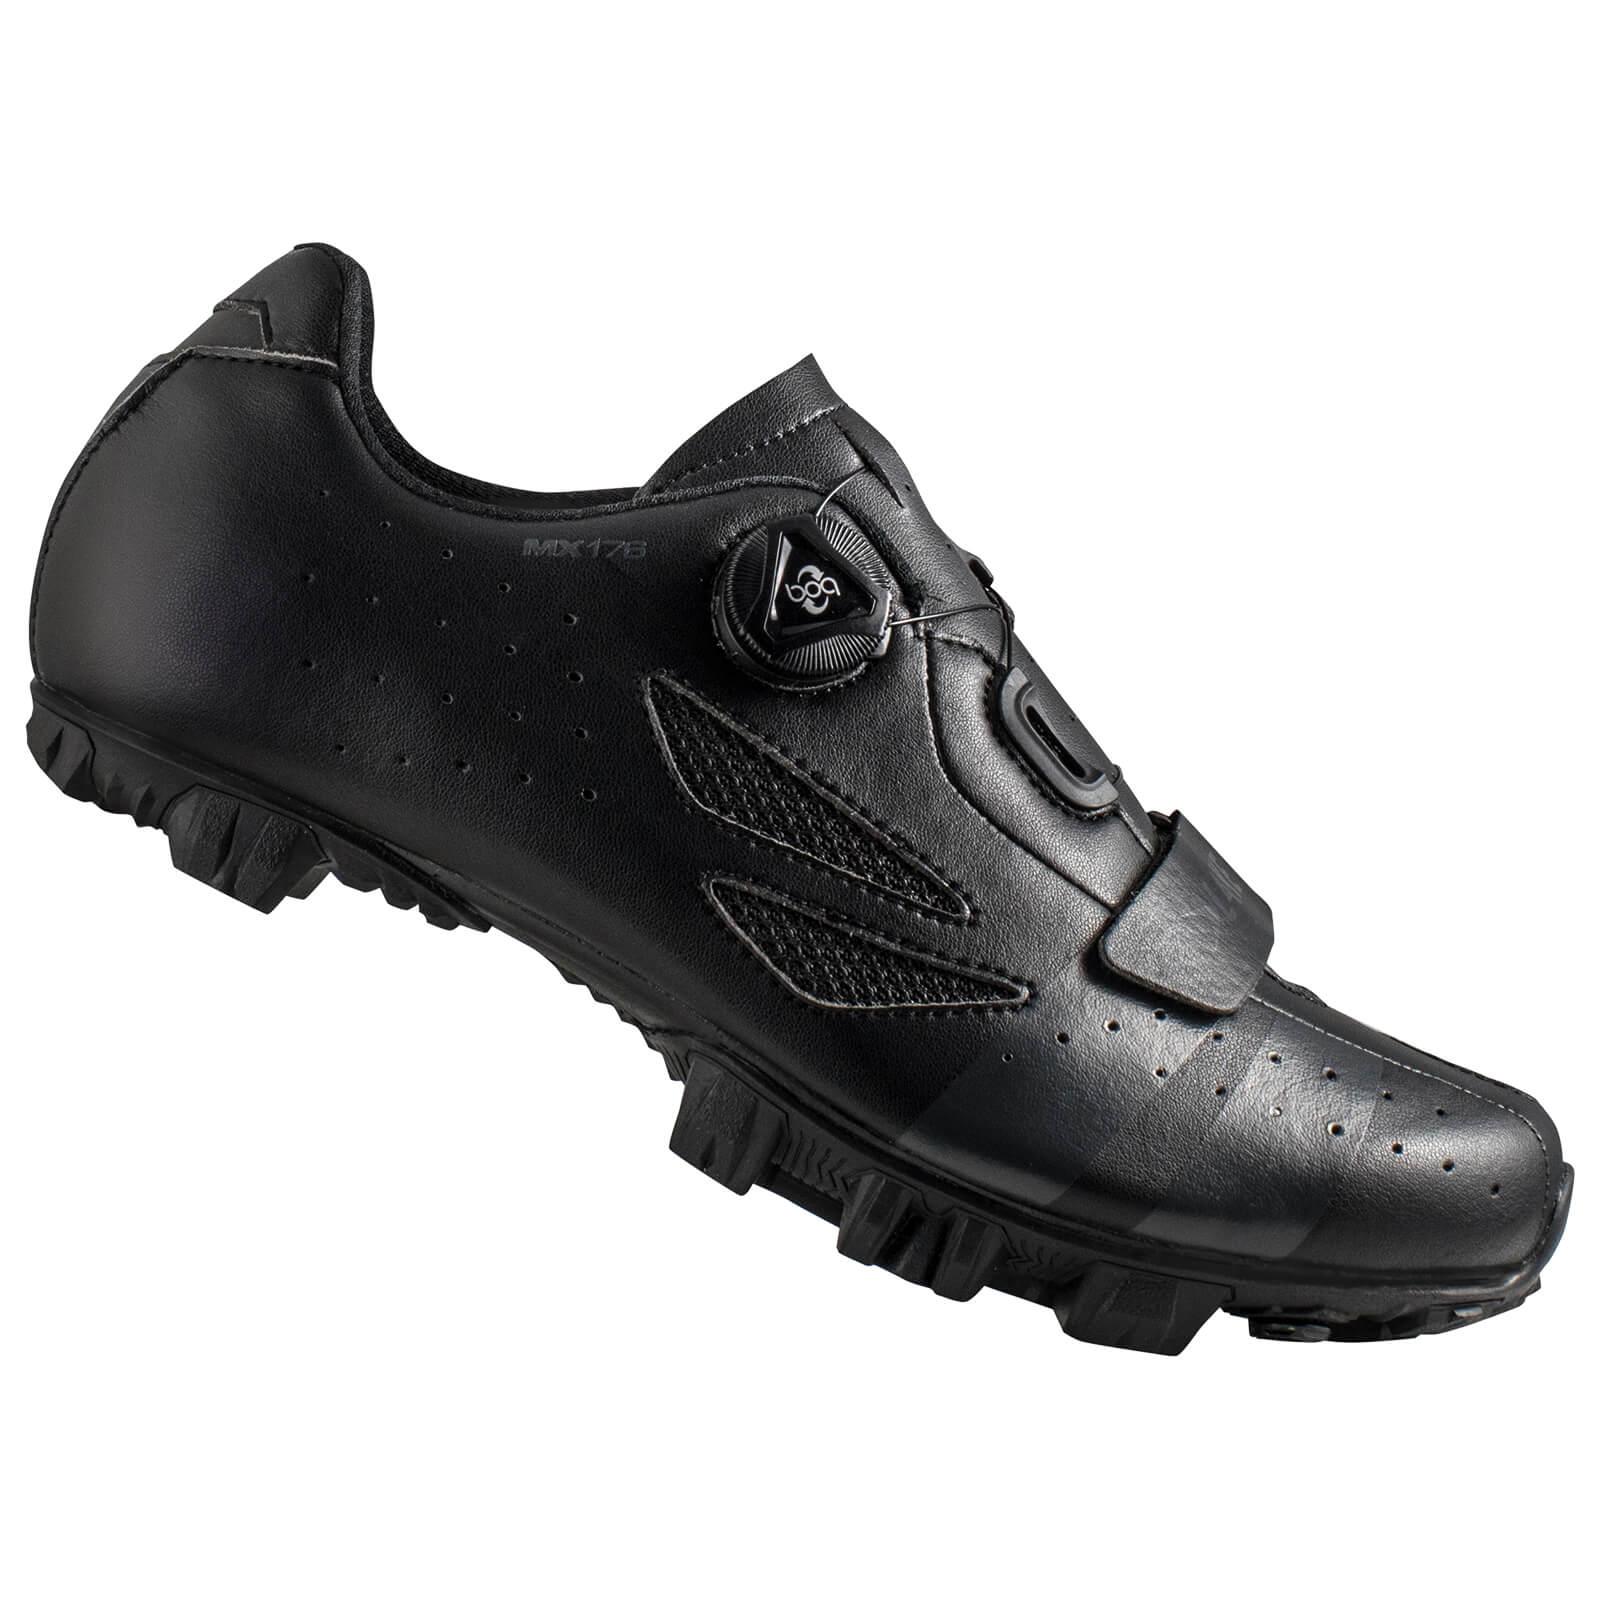 Lake MX176 Wide Fit MTB Shoes - Black/Grey - EU 46